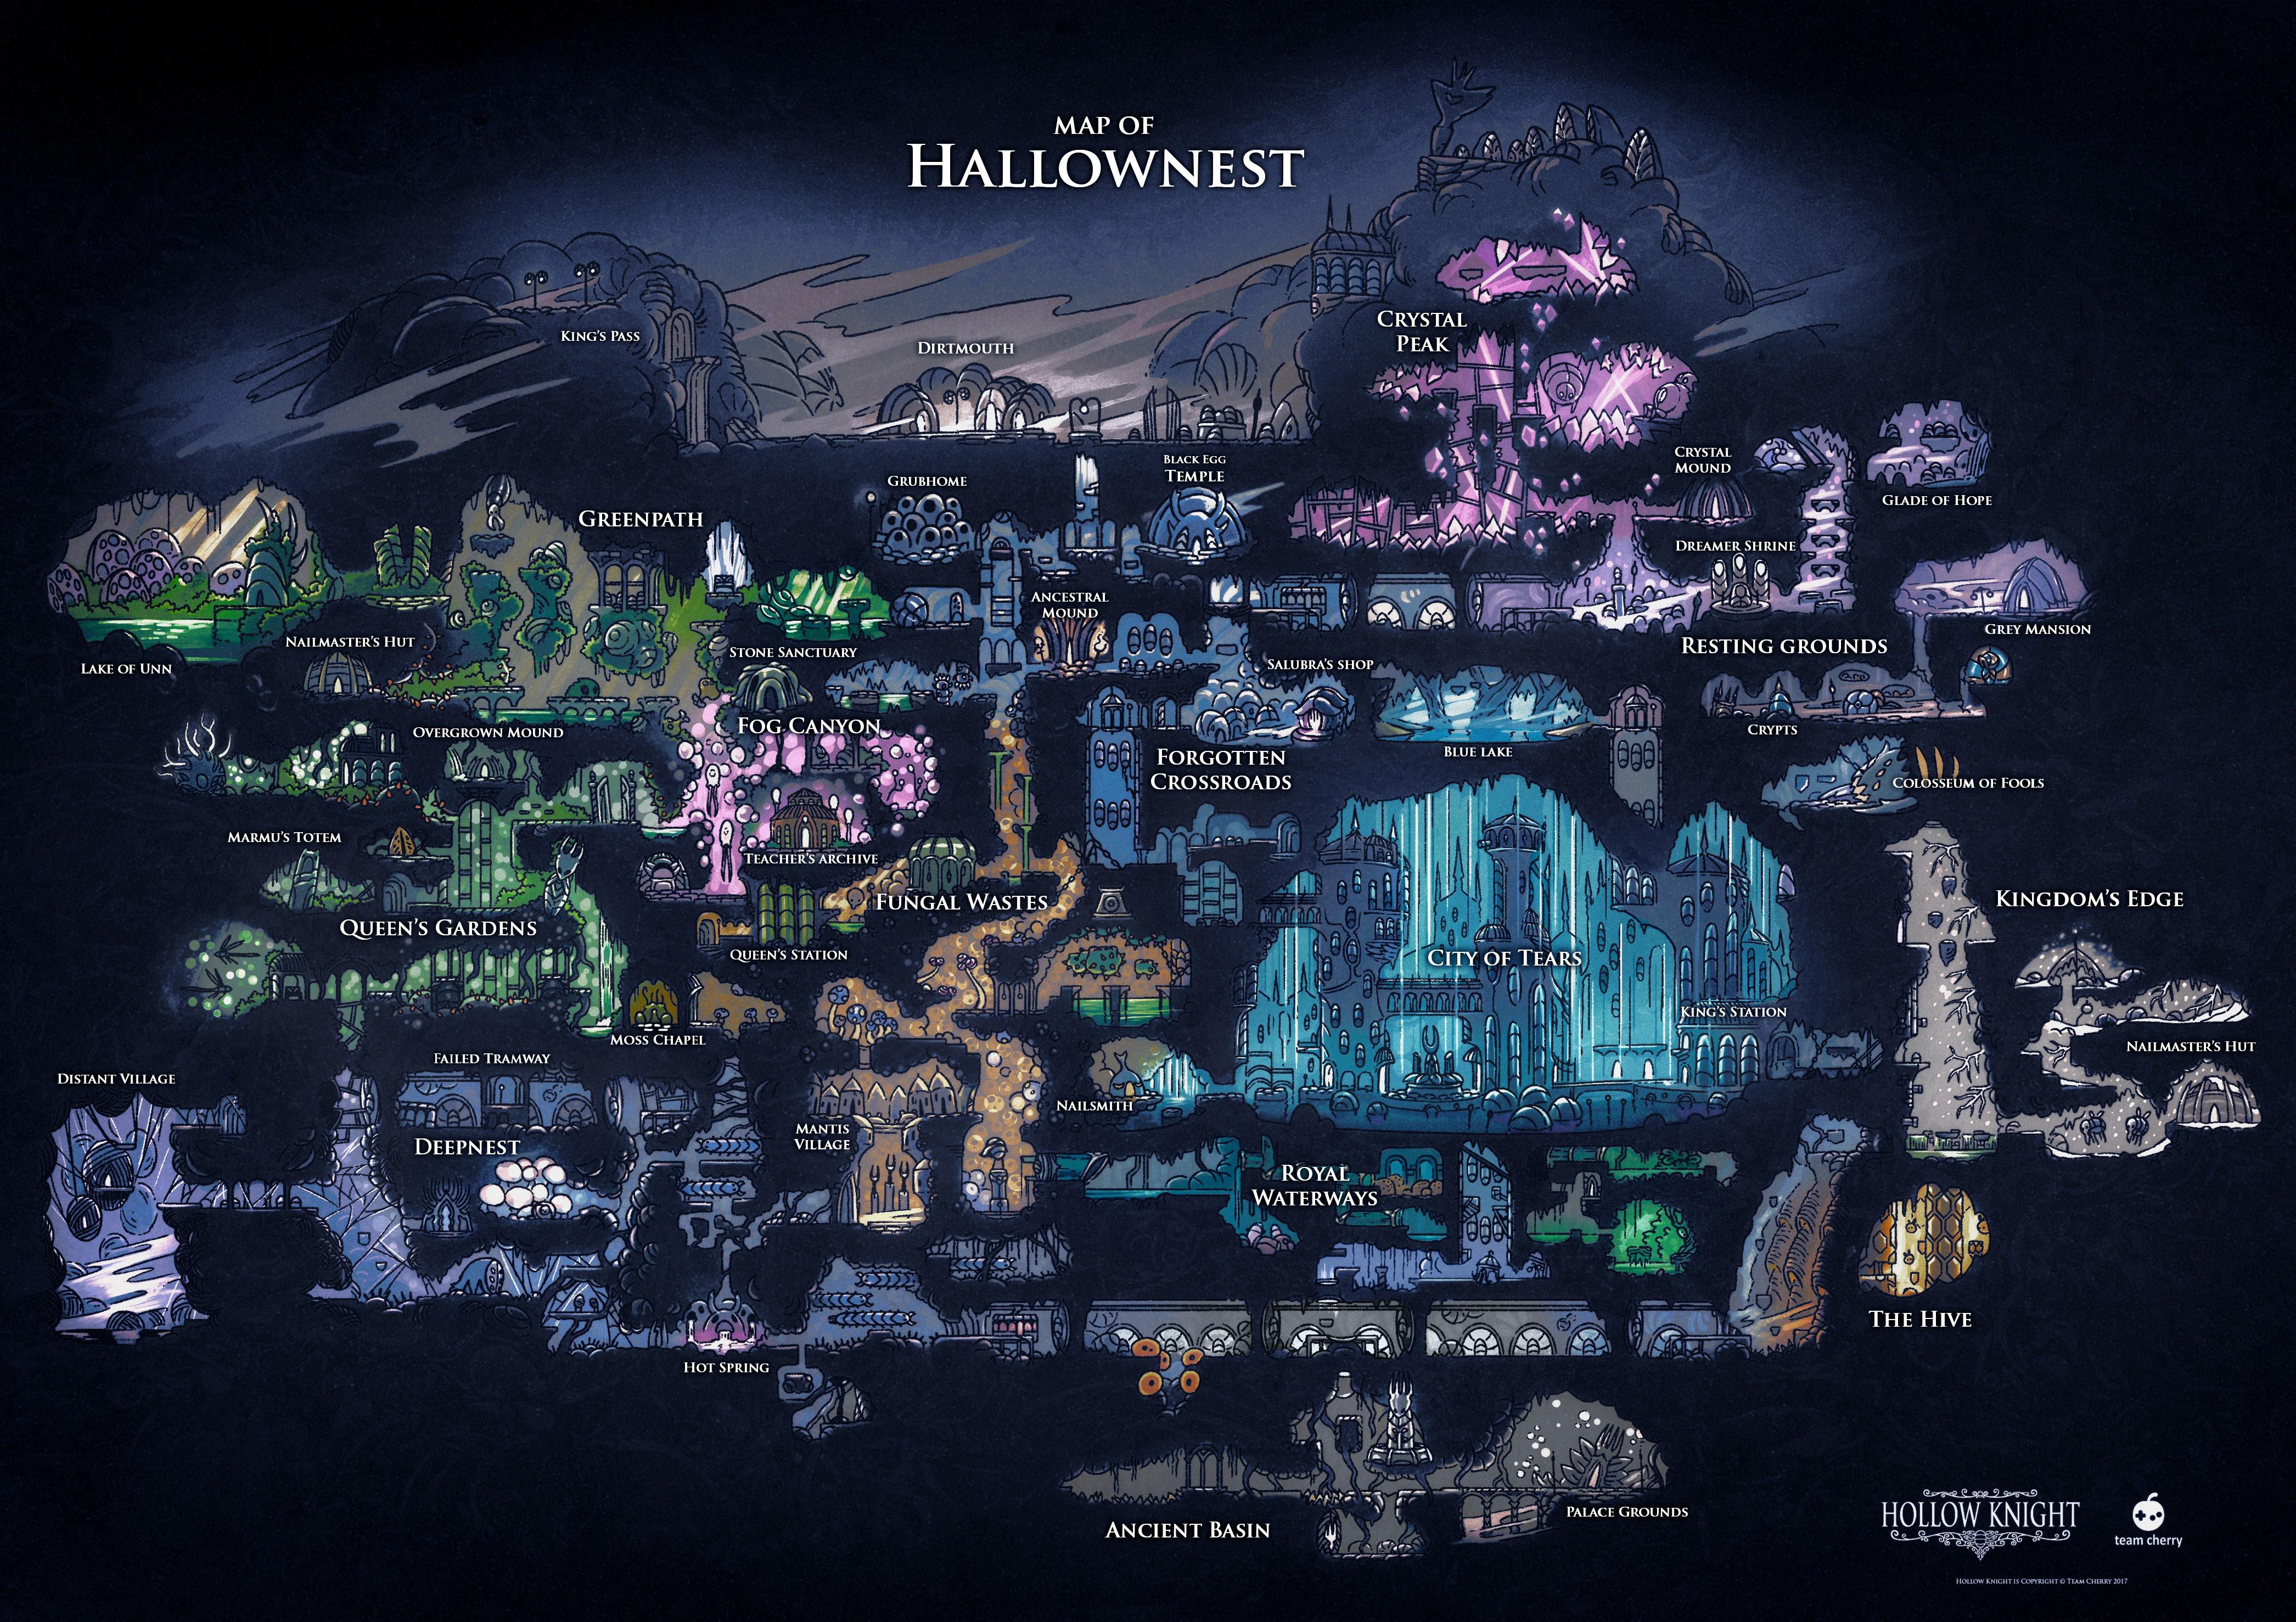 Hollow Knight   Hallownest Map | Art in 2019 | Pinterest | Knight